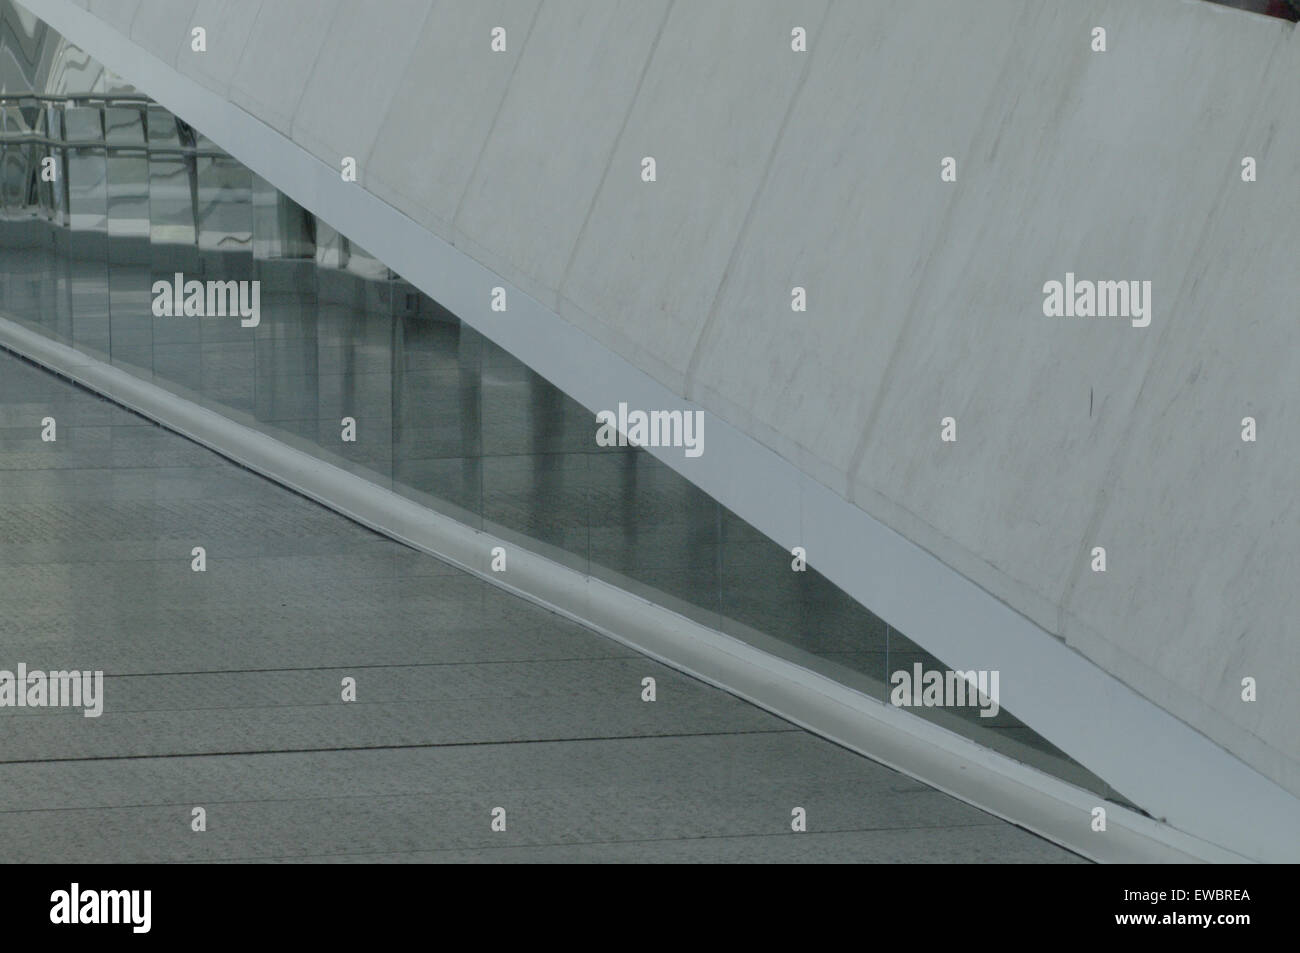 Ramp and Angles Plastic glass - Stock Image